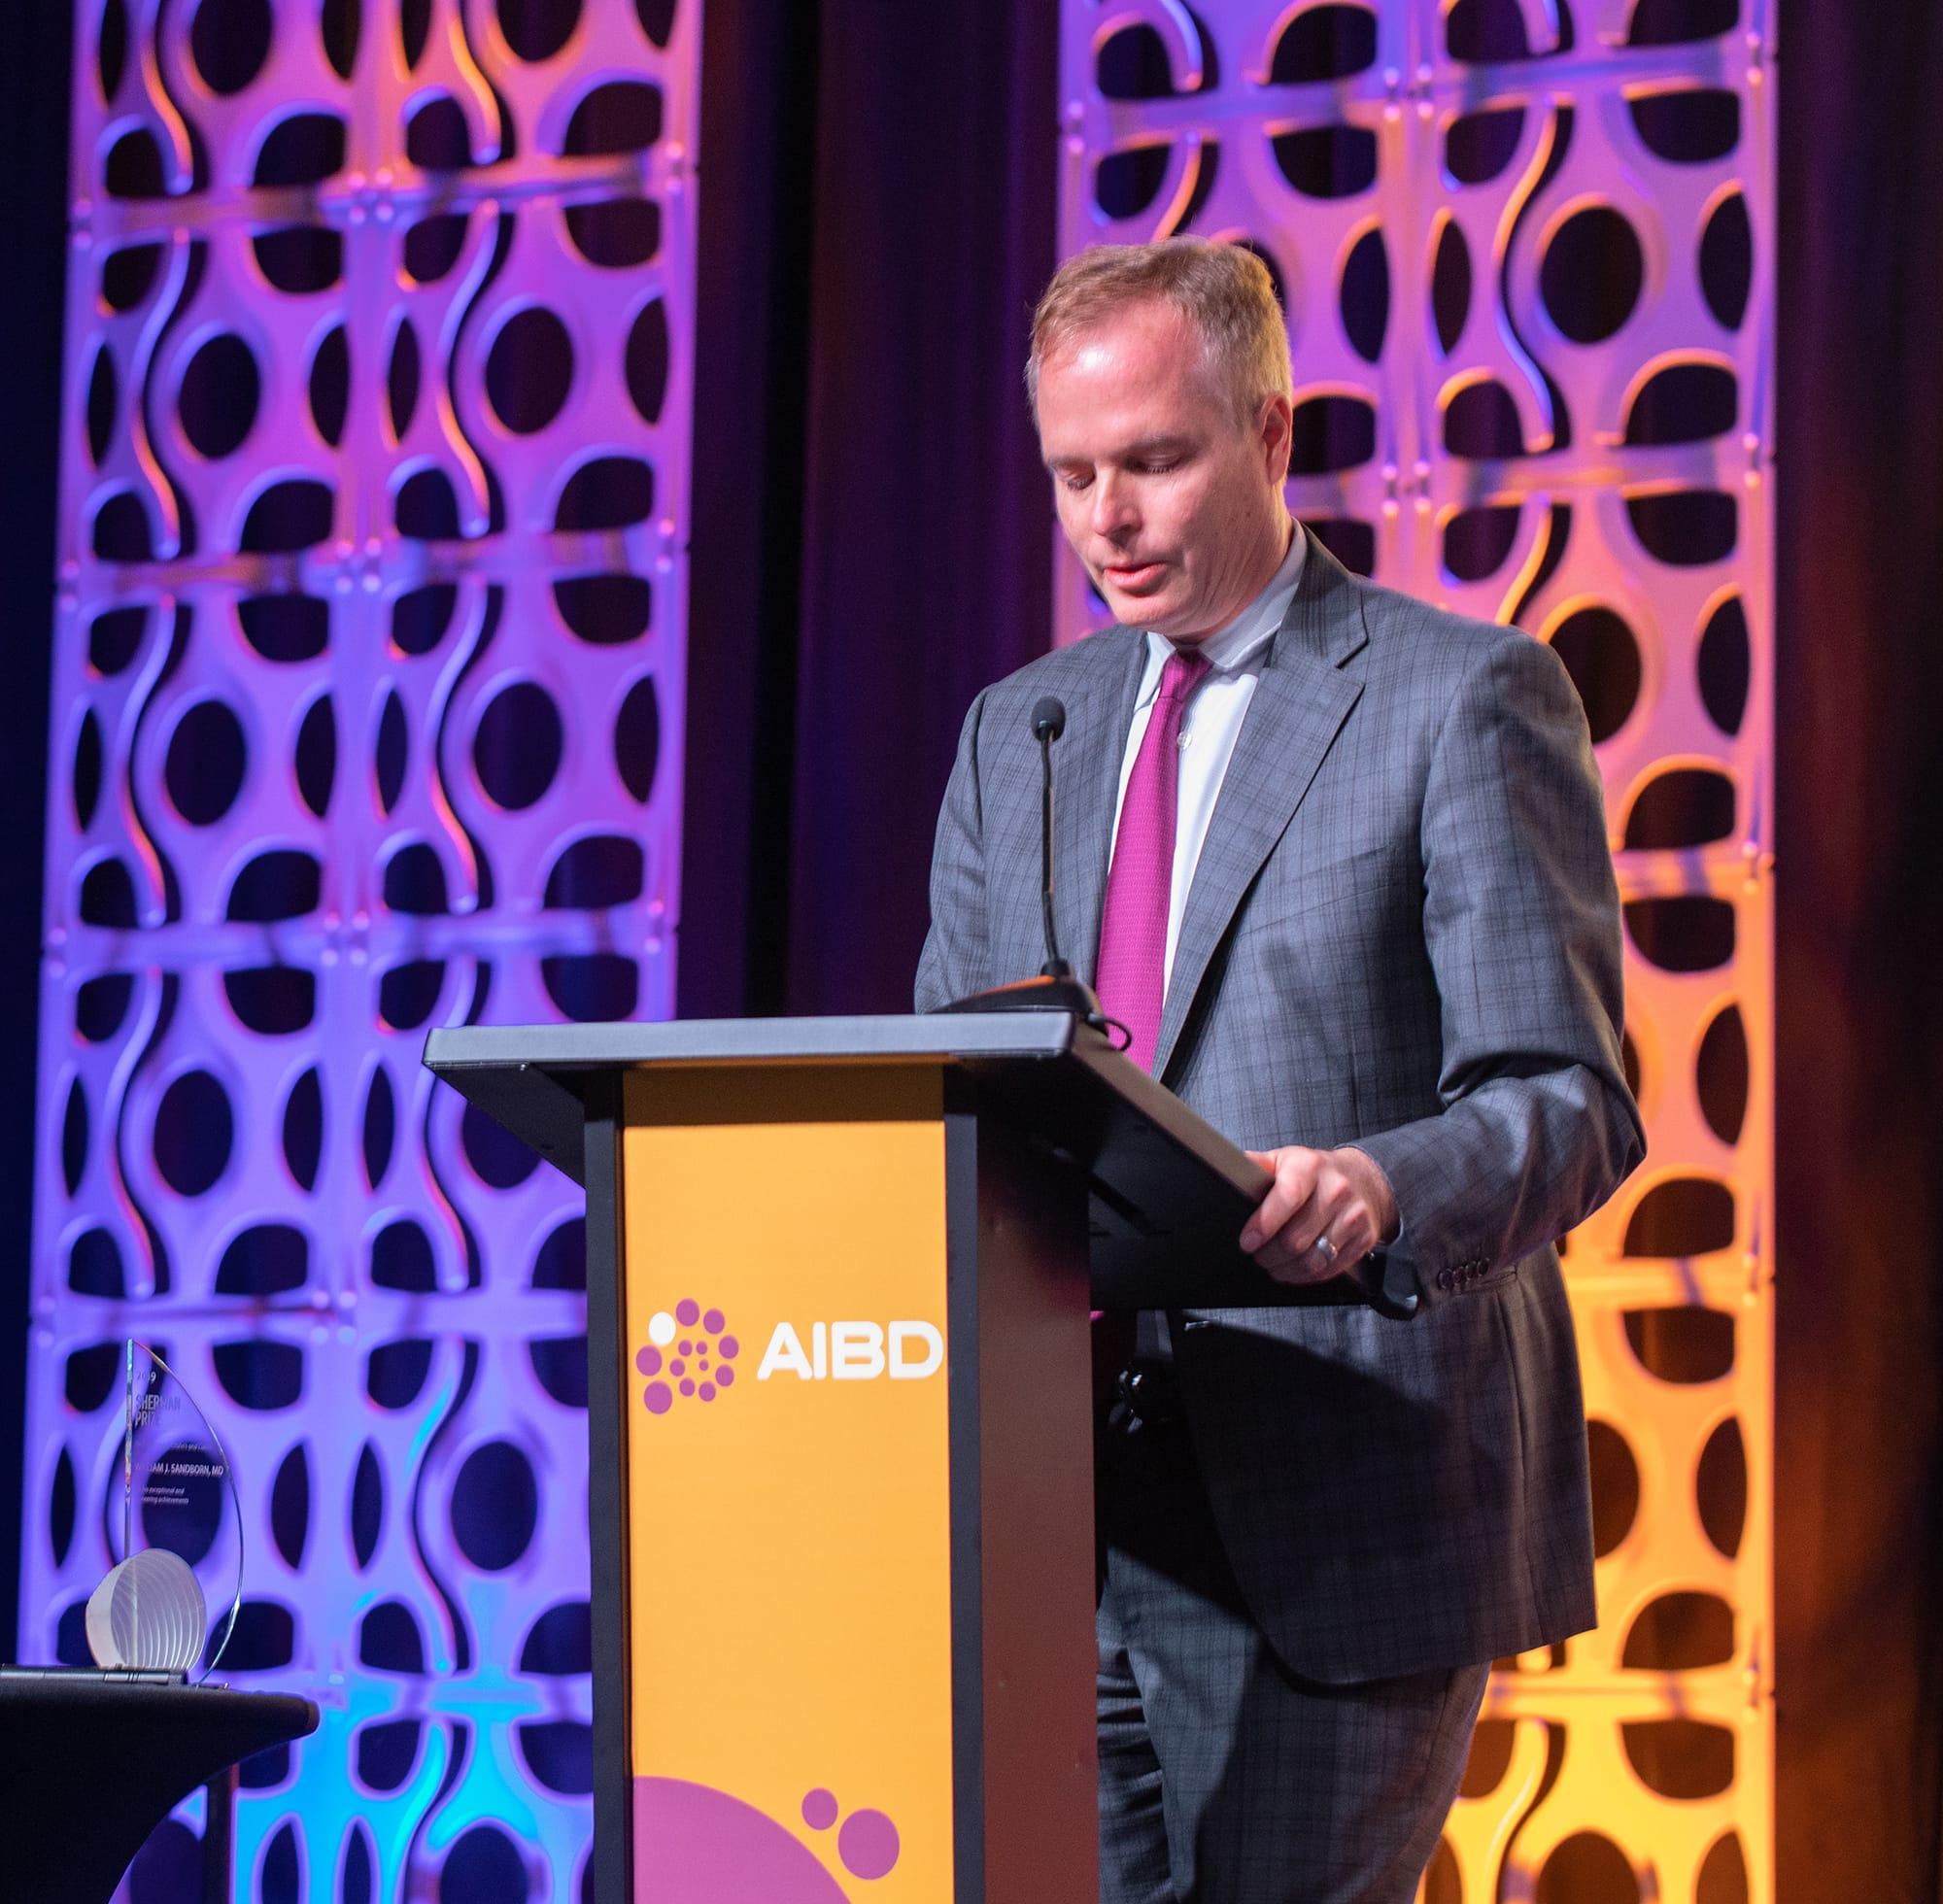 <p>2019 Sherman Prize Recipient: Dr. William Sandborn</p>